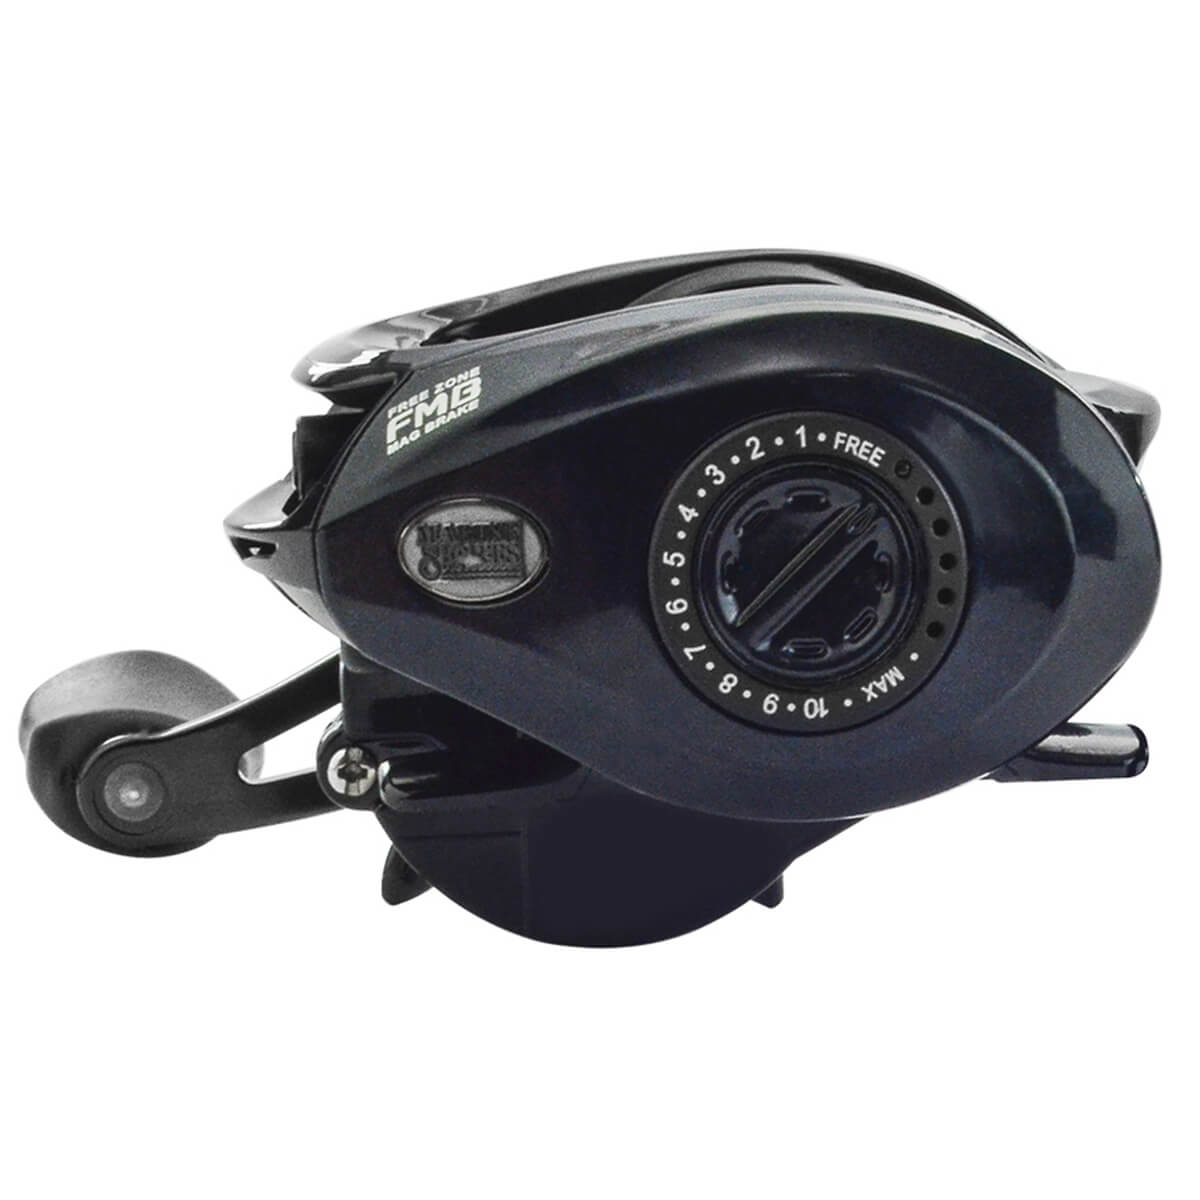 Carretilha Marine Sports Venza GTO 7000 SHI/SHIL 7.3:1 7 Rolamentos